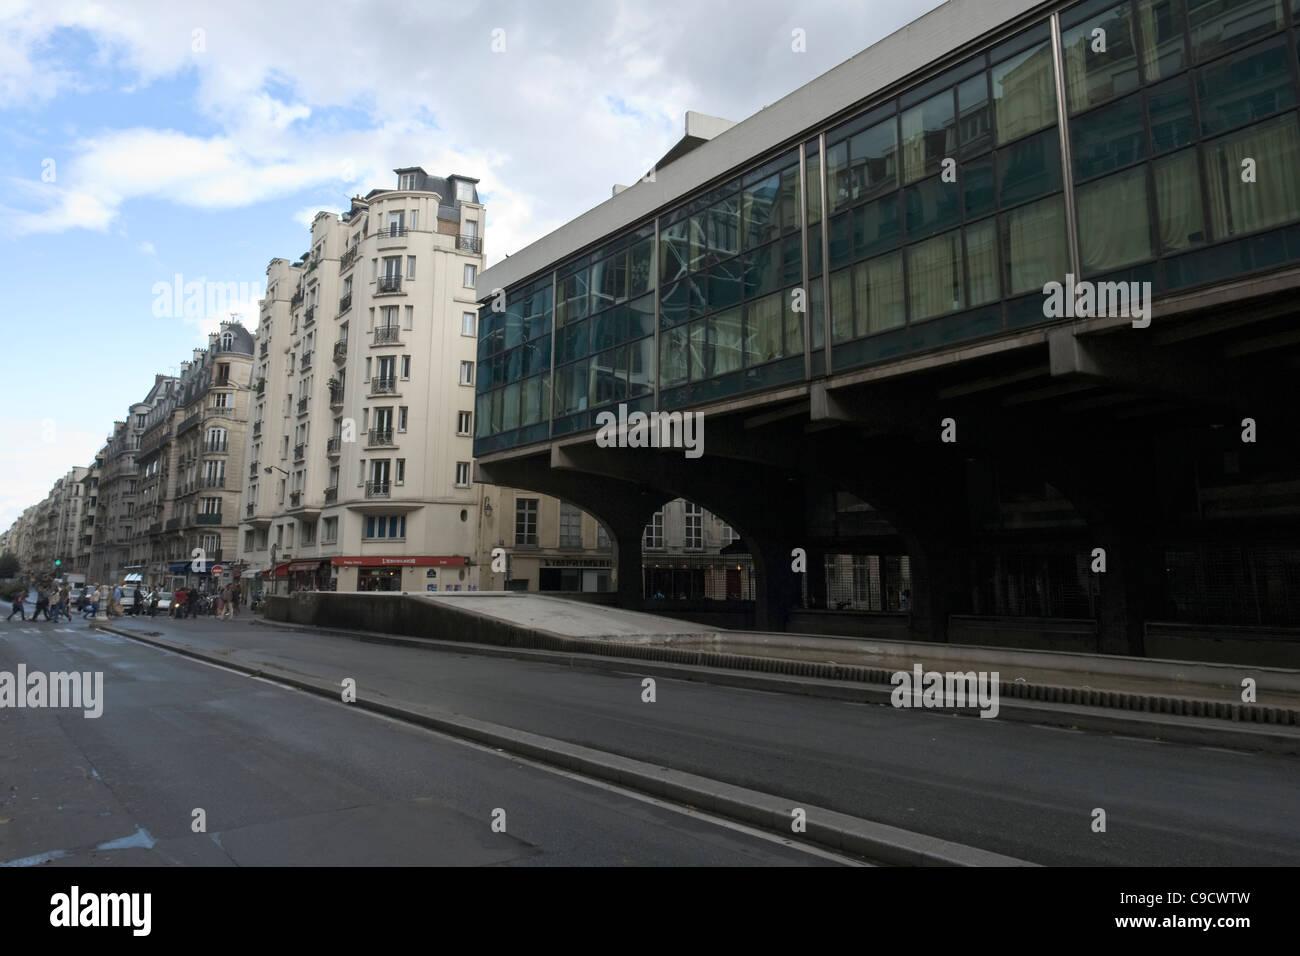 Contrast of architectures in rue du Renard, Paris, France - Stock Image